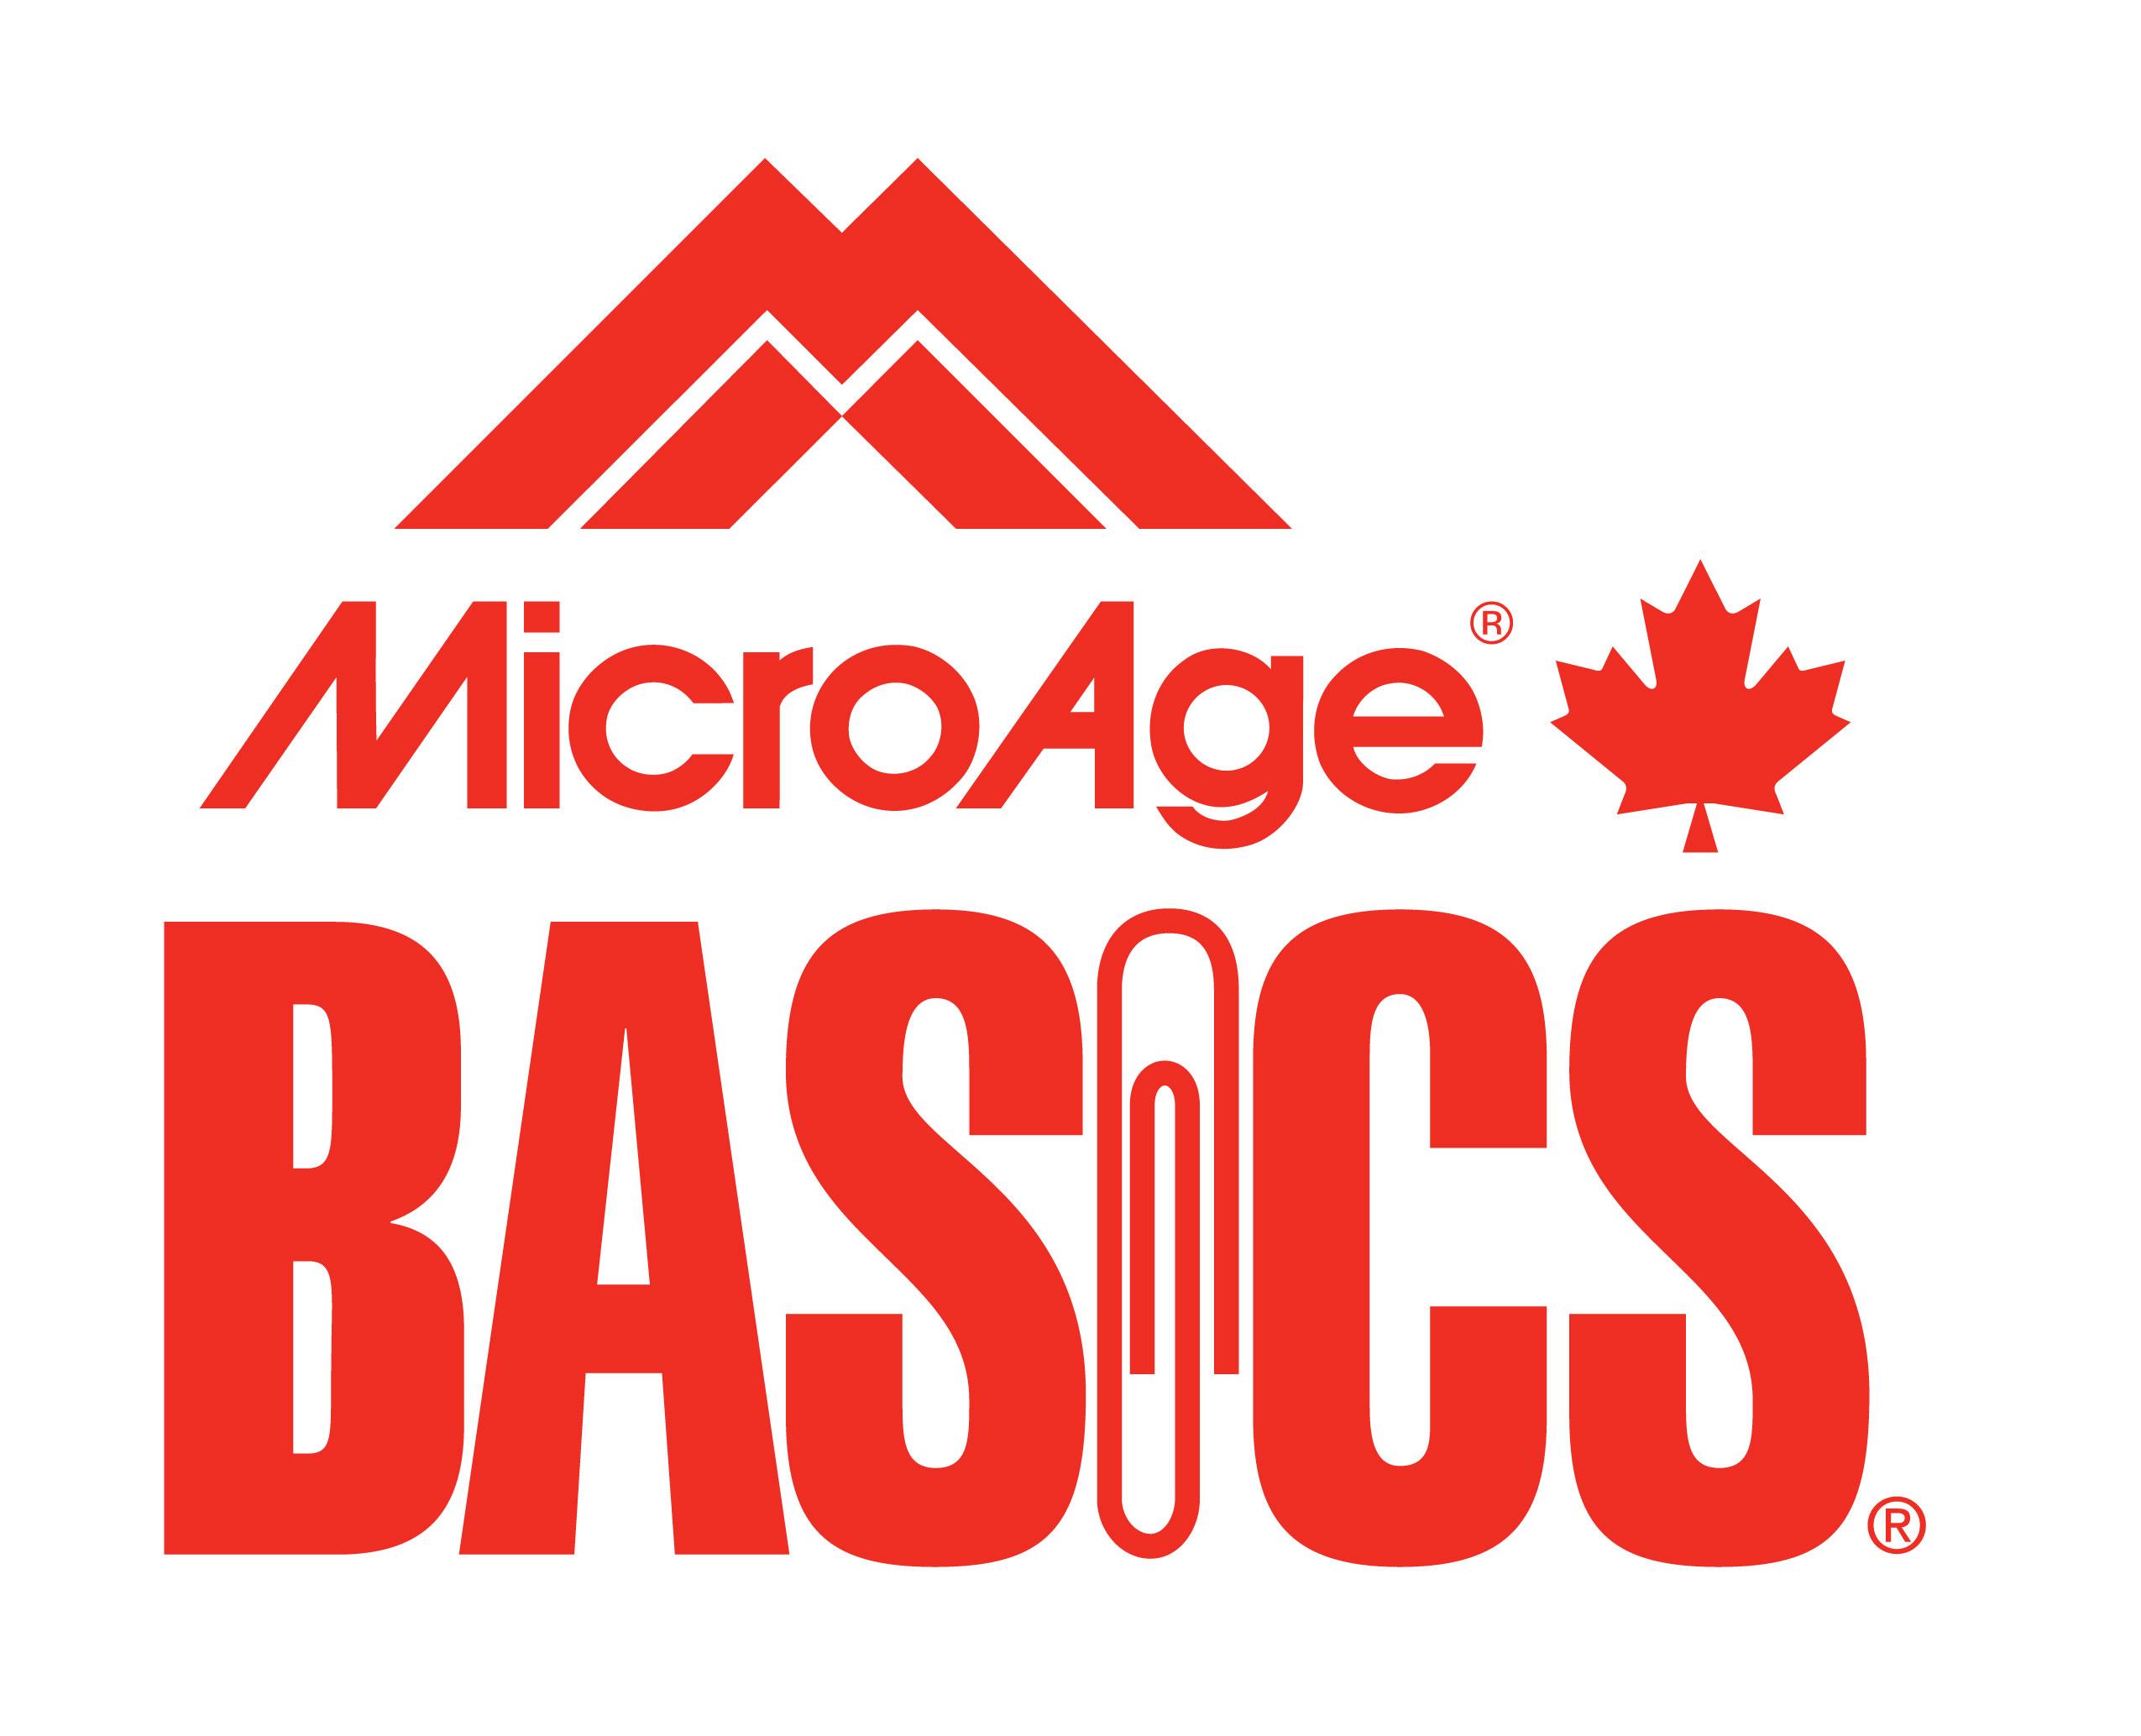 MicroAge Basics